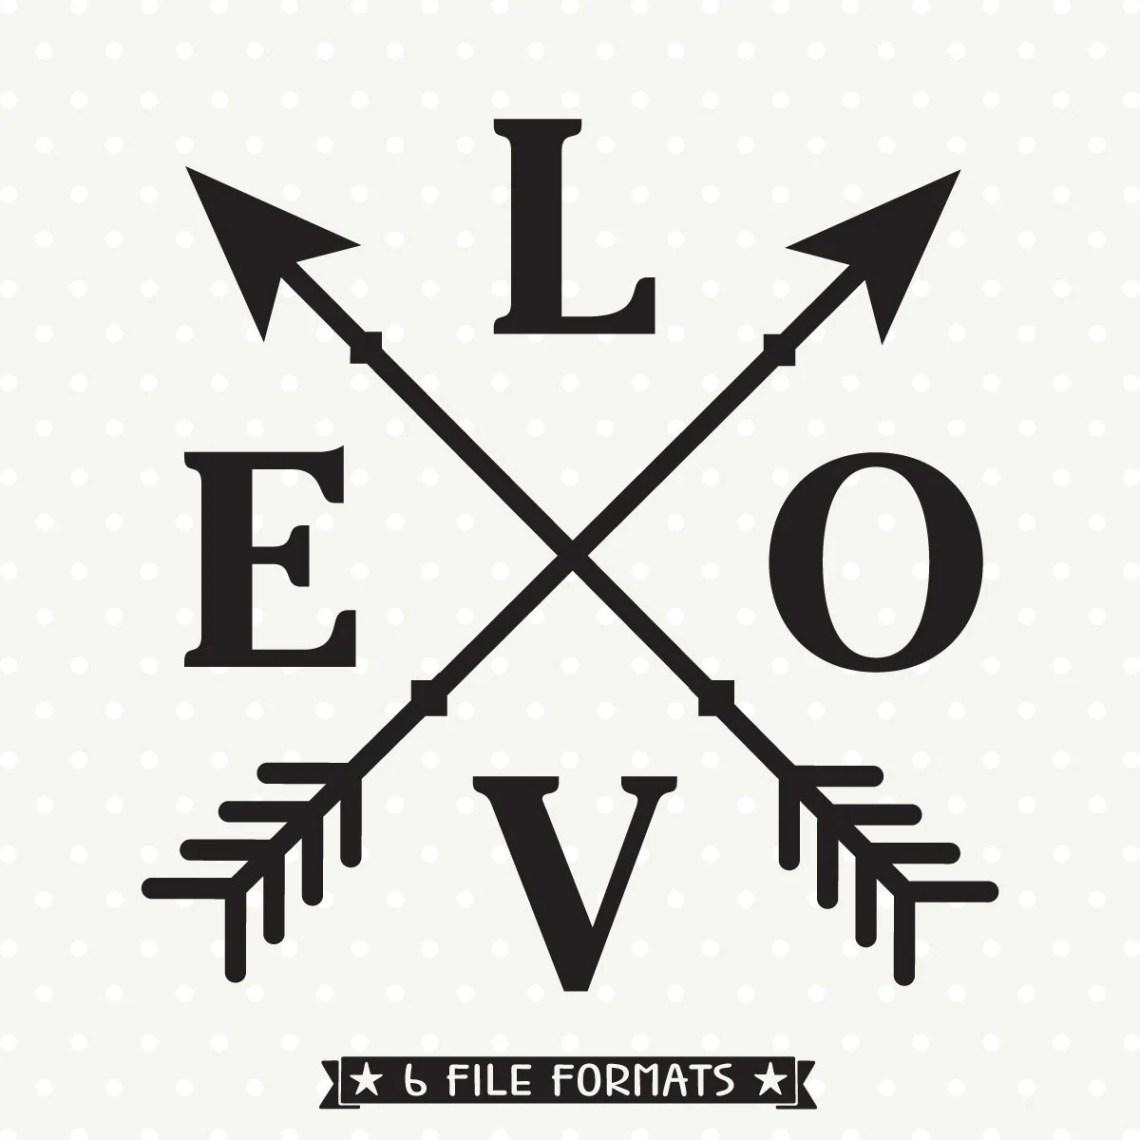 Download Love svg, Love Arrows SVG, Love cut file, Valentines Day ...